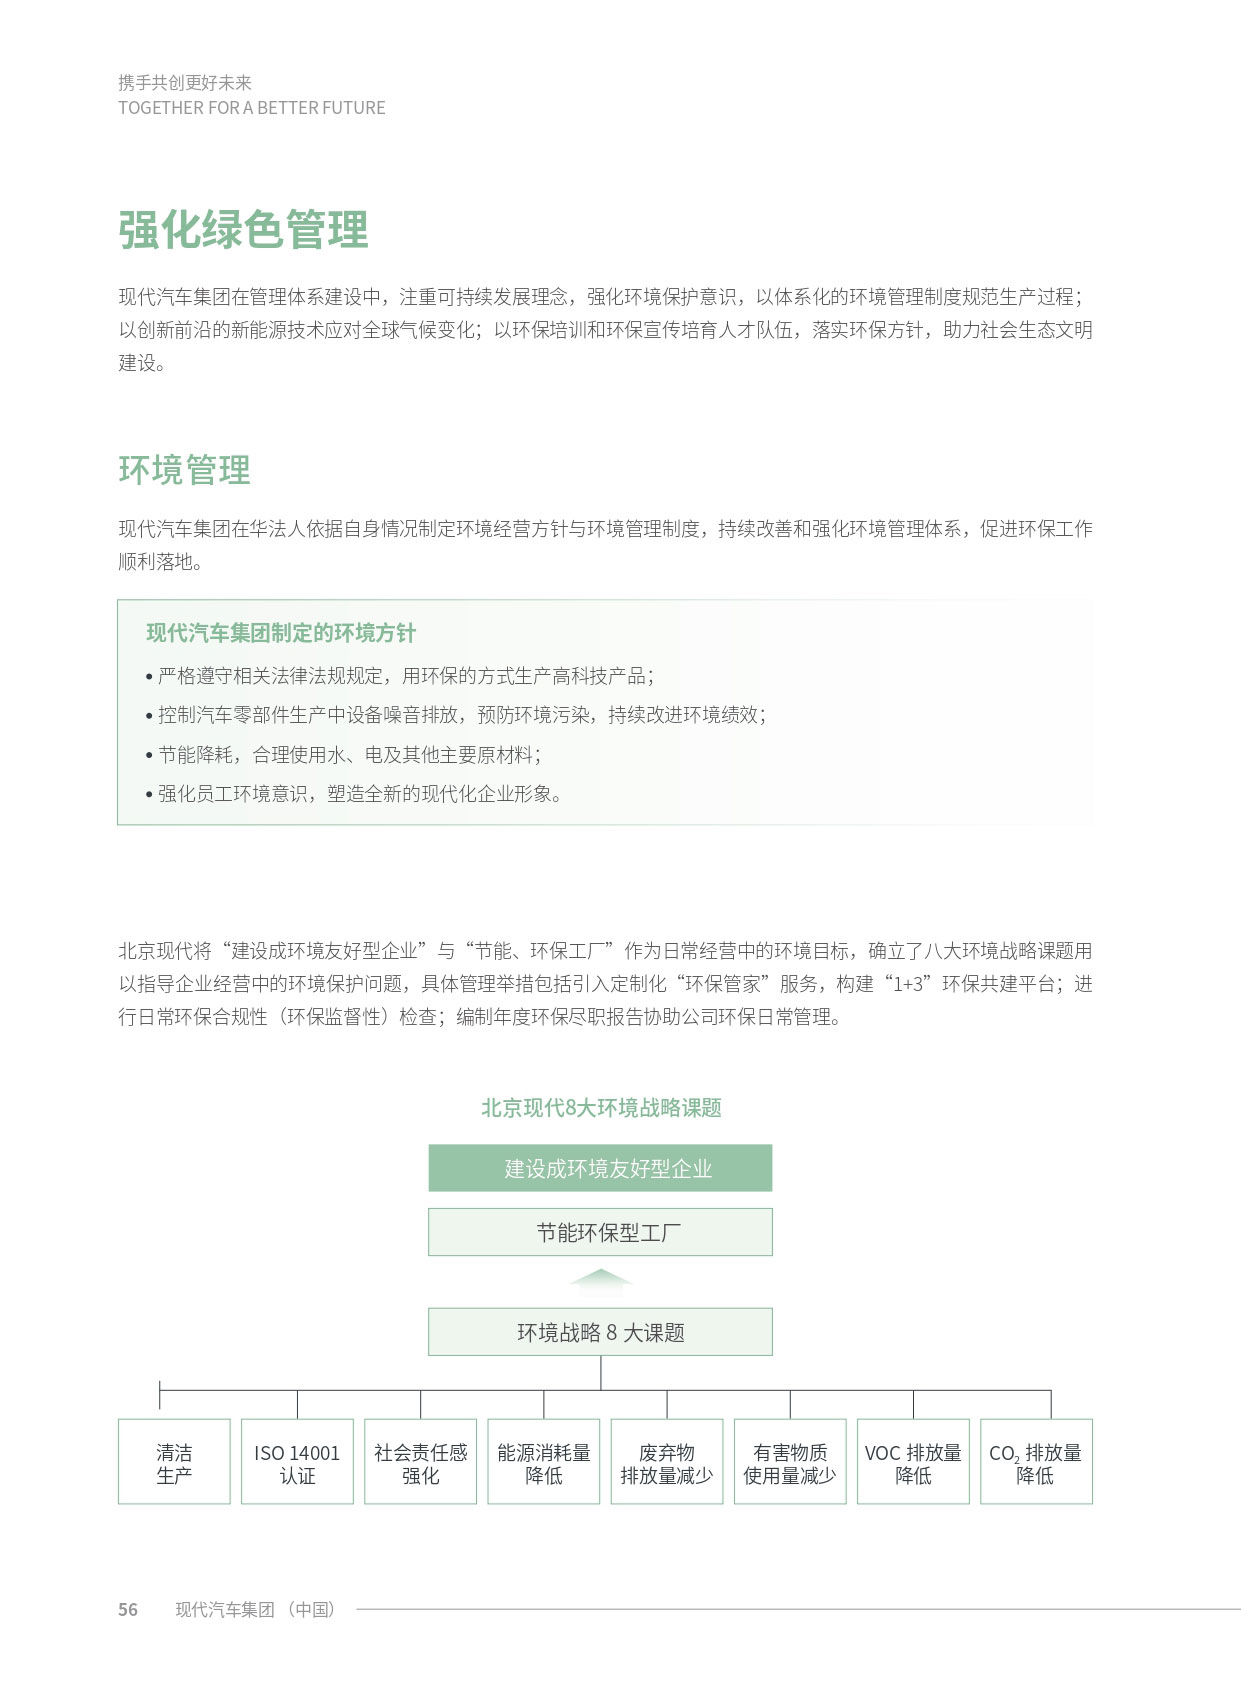 hyundai_china_csr_2018_page-0030_01